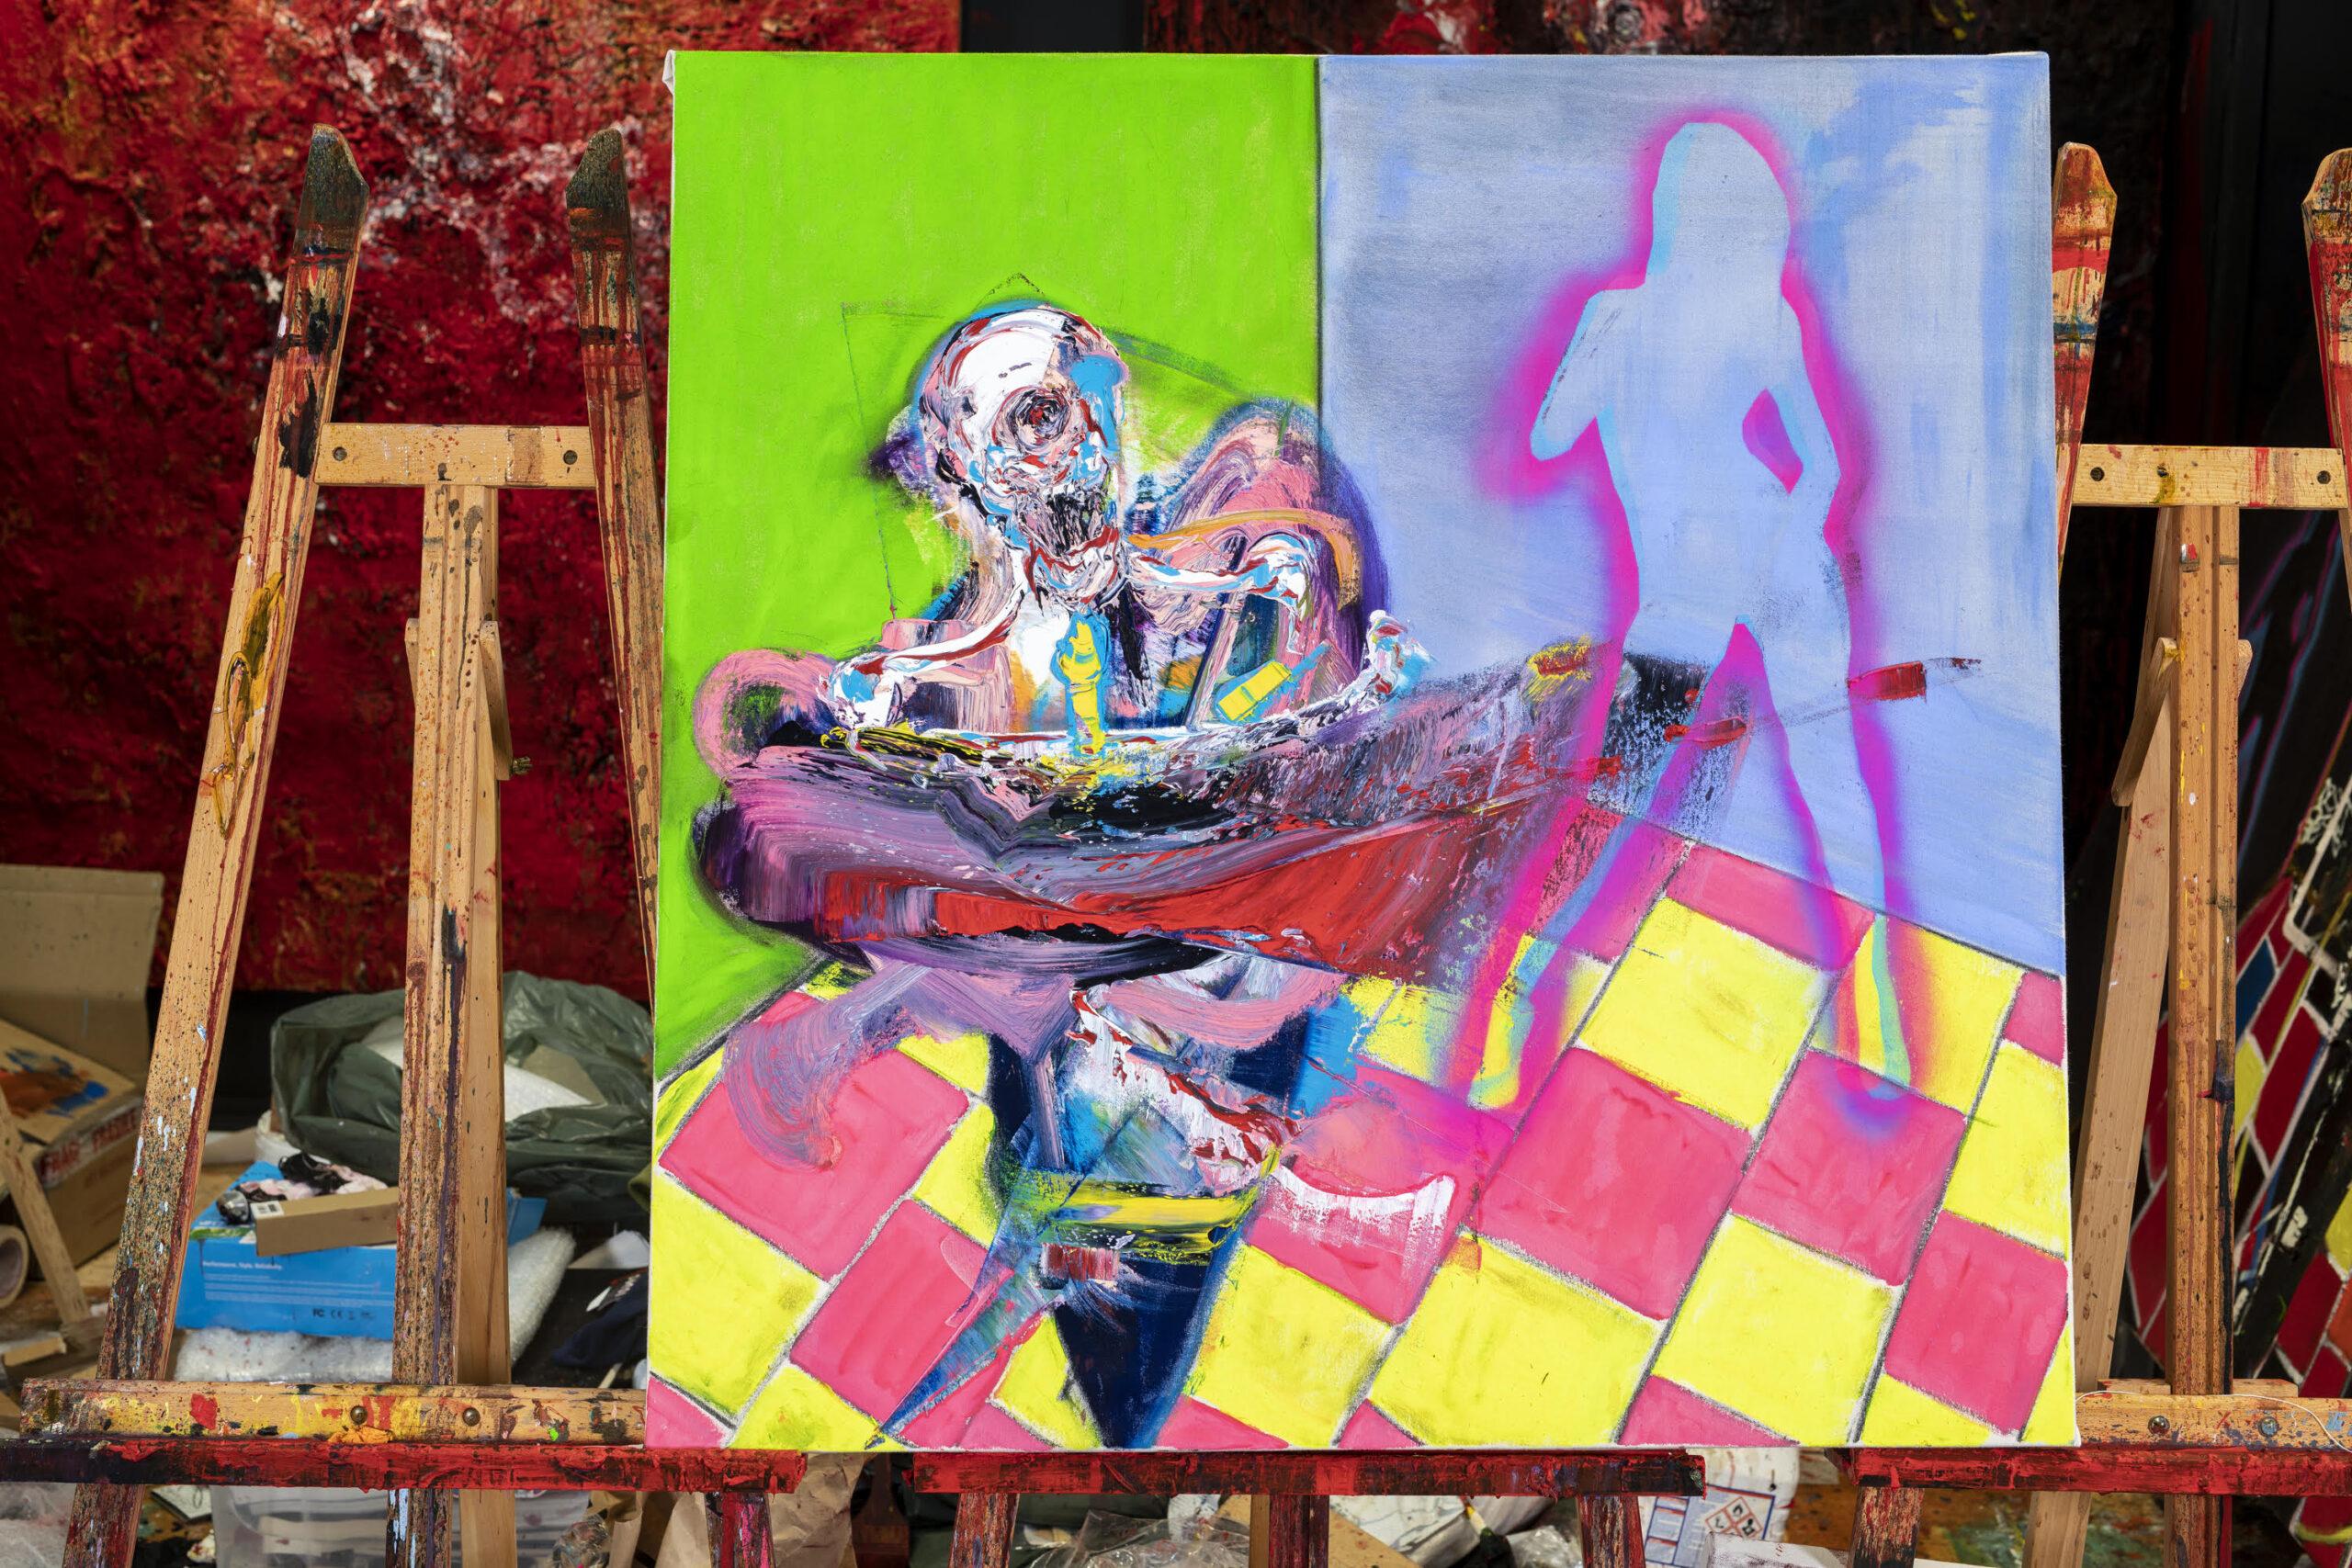 Studio of British artist Lincoln Townley